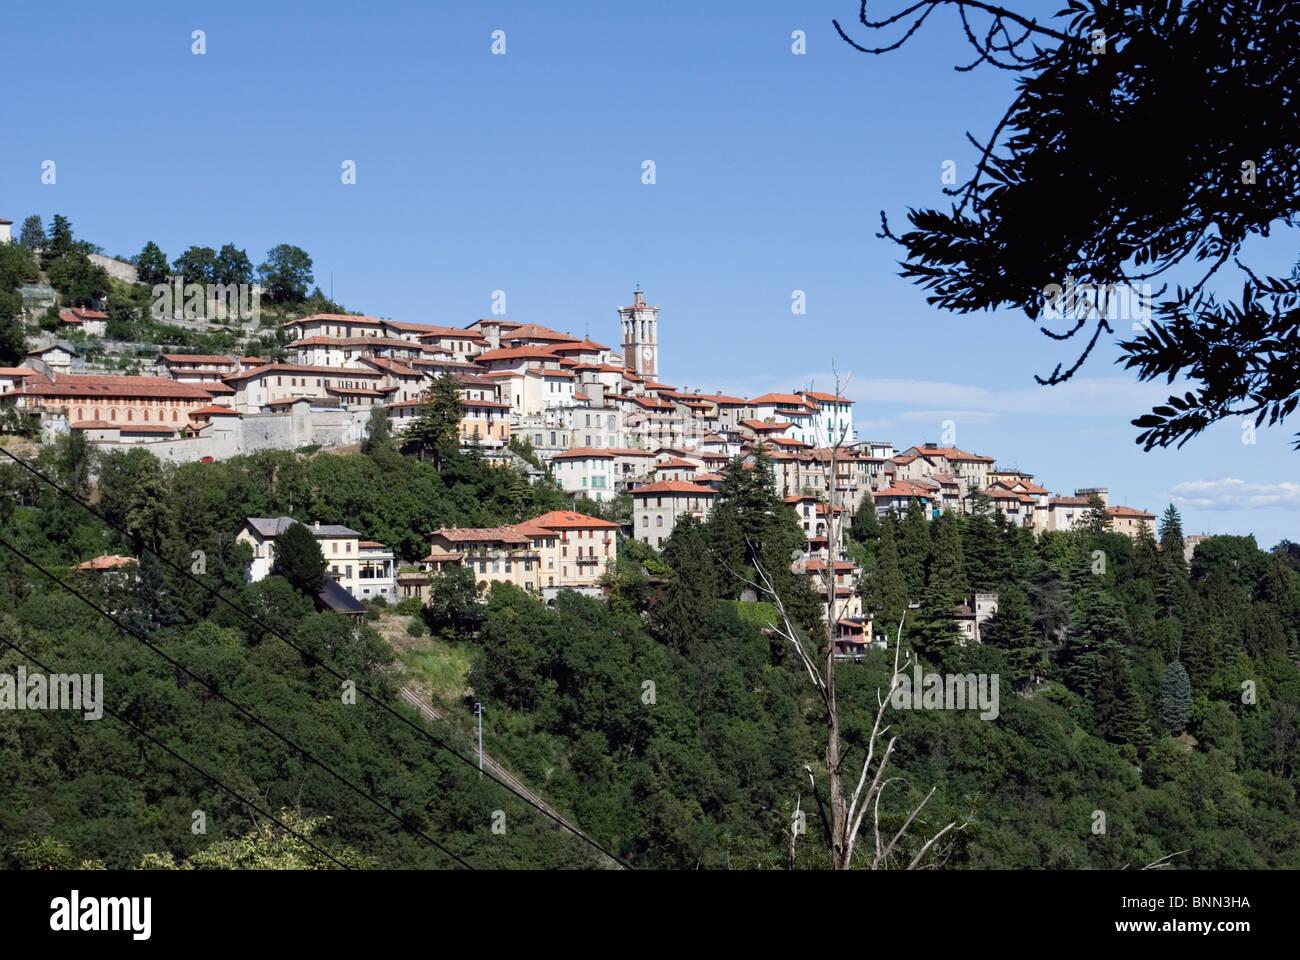 Varese Italien santa monte sacro monte di varese varese lombardei